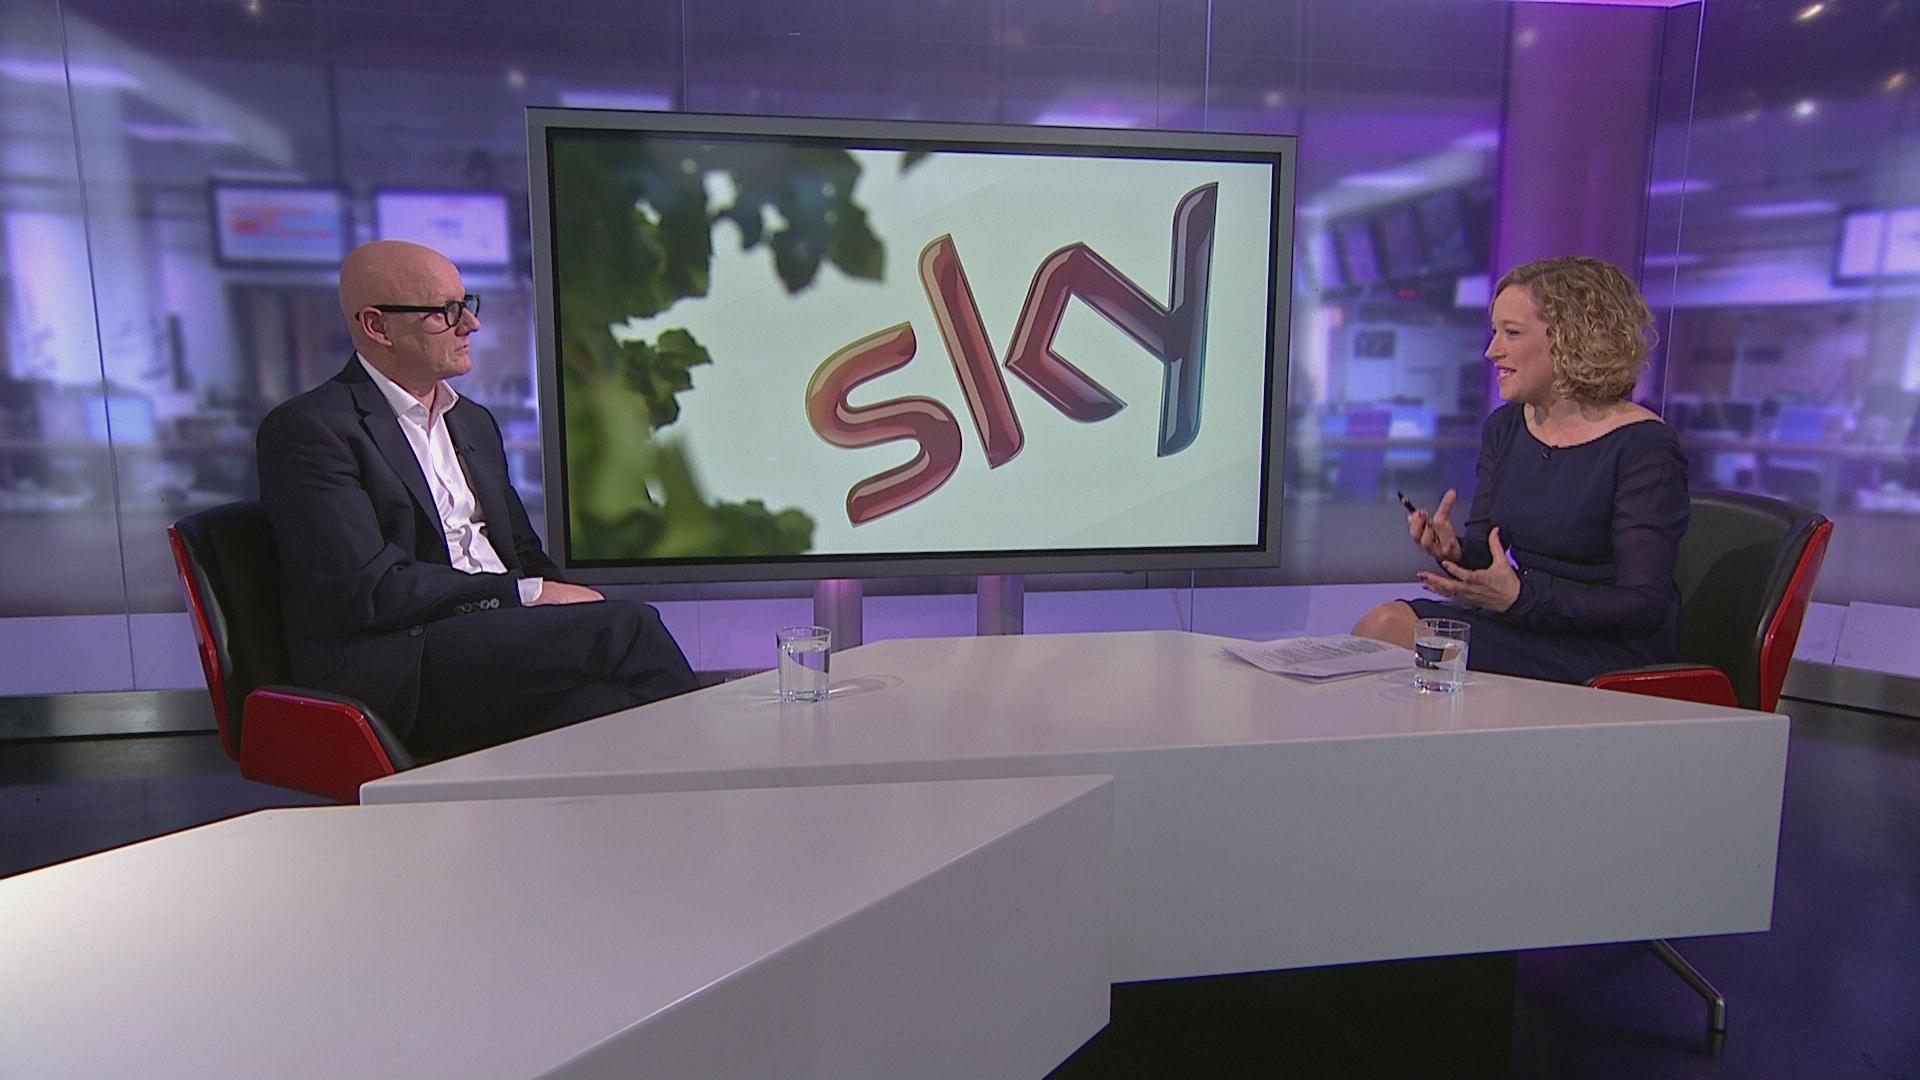 Sky interview